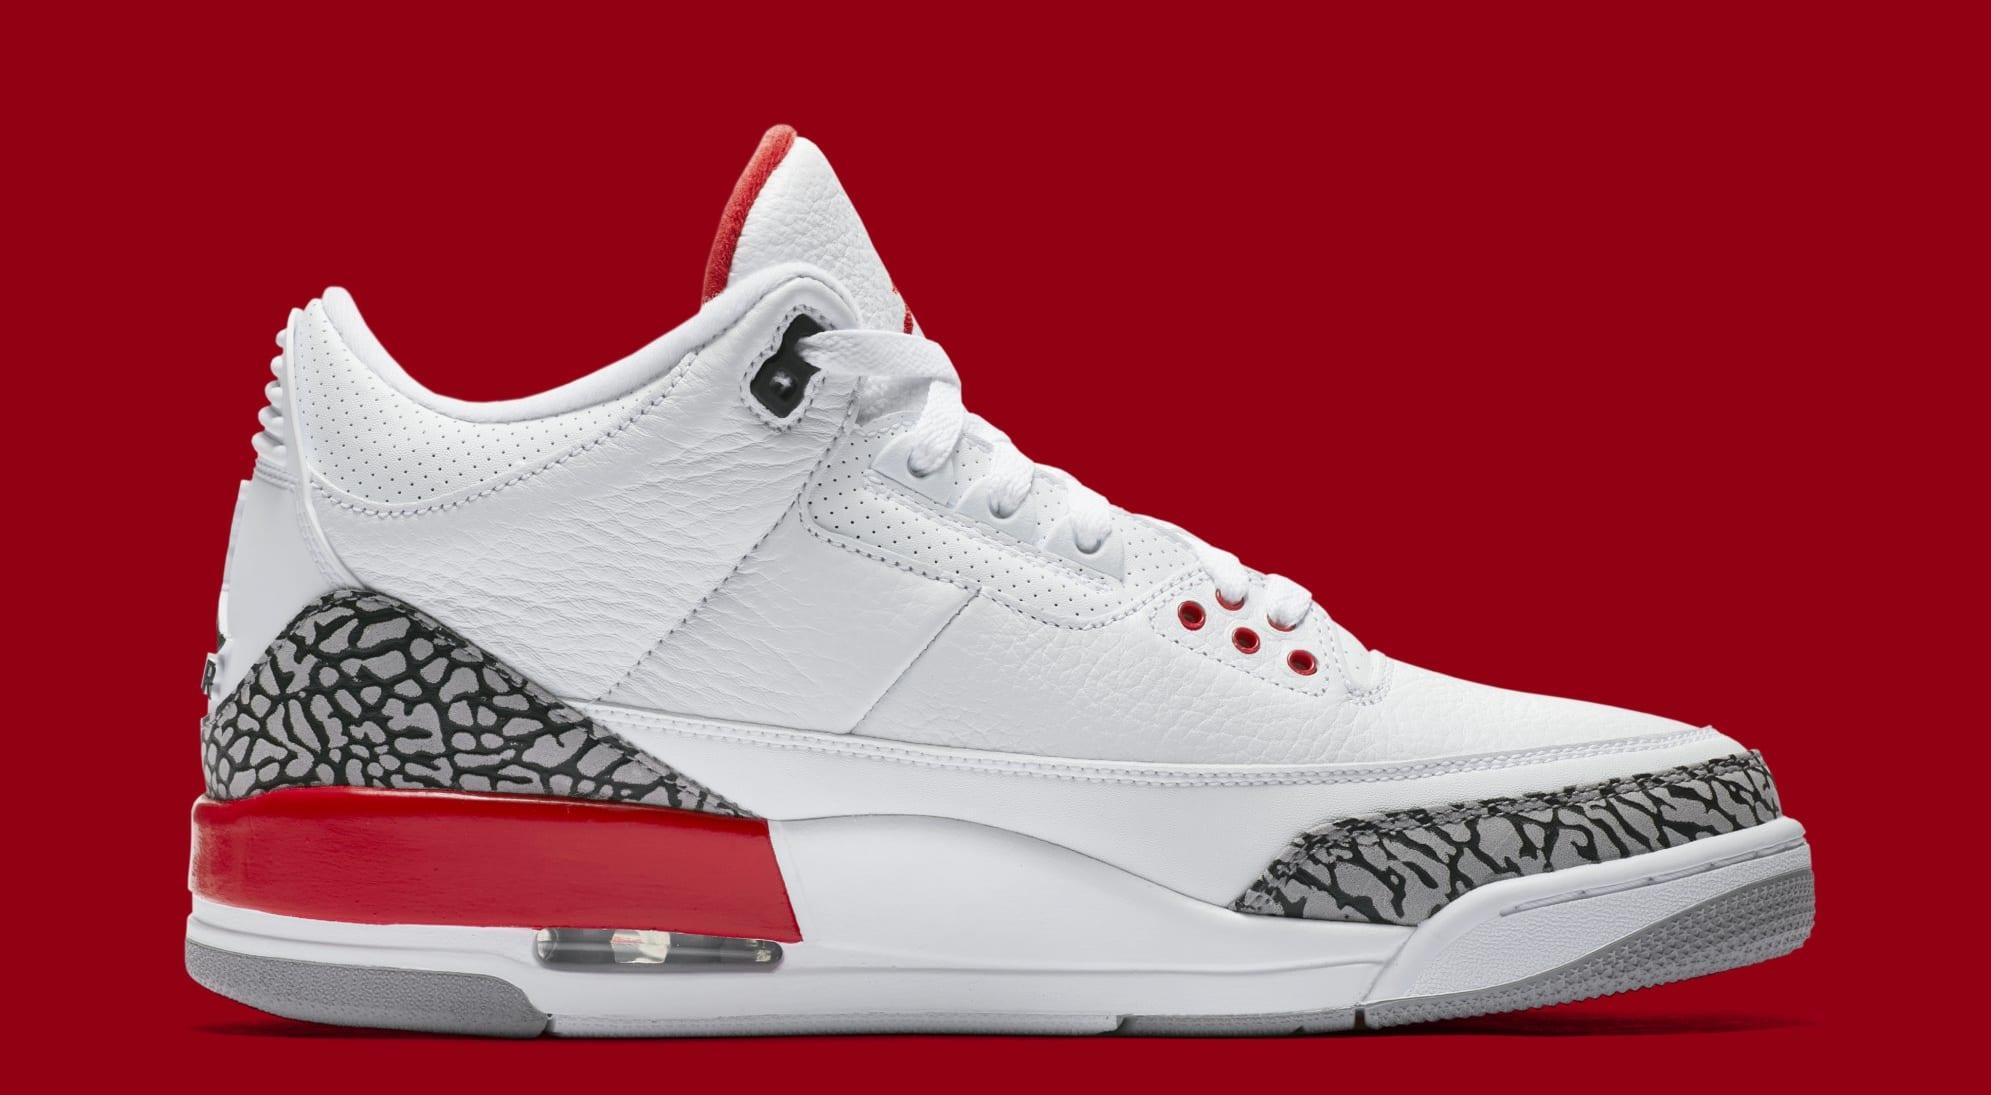 4c2a8827424833 Katrina Air Jordan 3 Retro Release Date 136064-116 - Premier Kicks